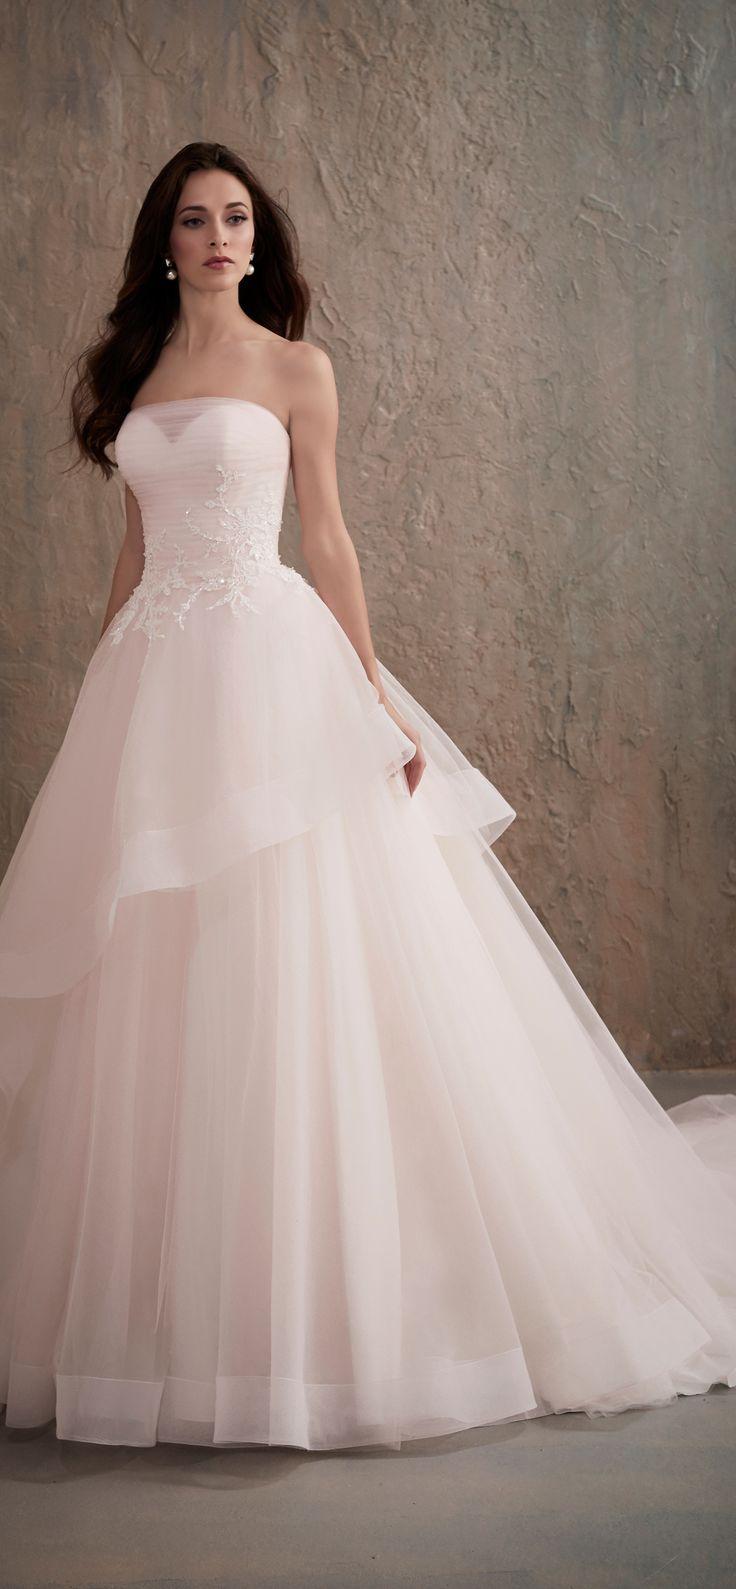 Blush Ballgown Wedding Dress  by Christina Wu Brides   @HouseofWuBrands #AdriannaPapellPlatinum #AdriannaPapell #HouseofWu